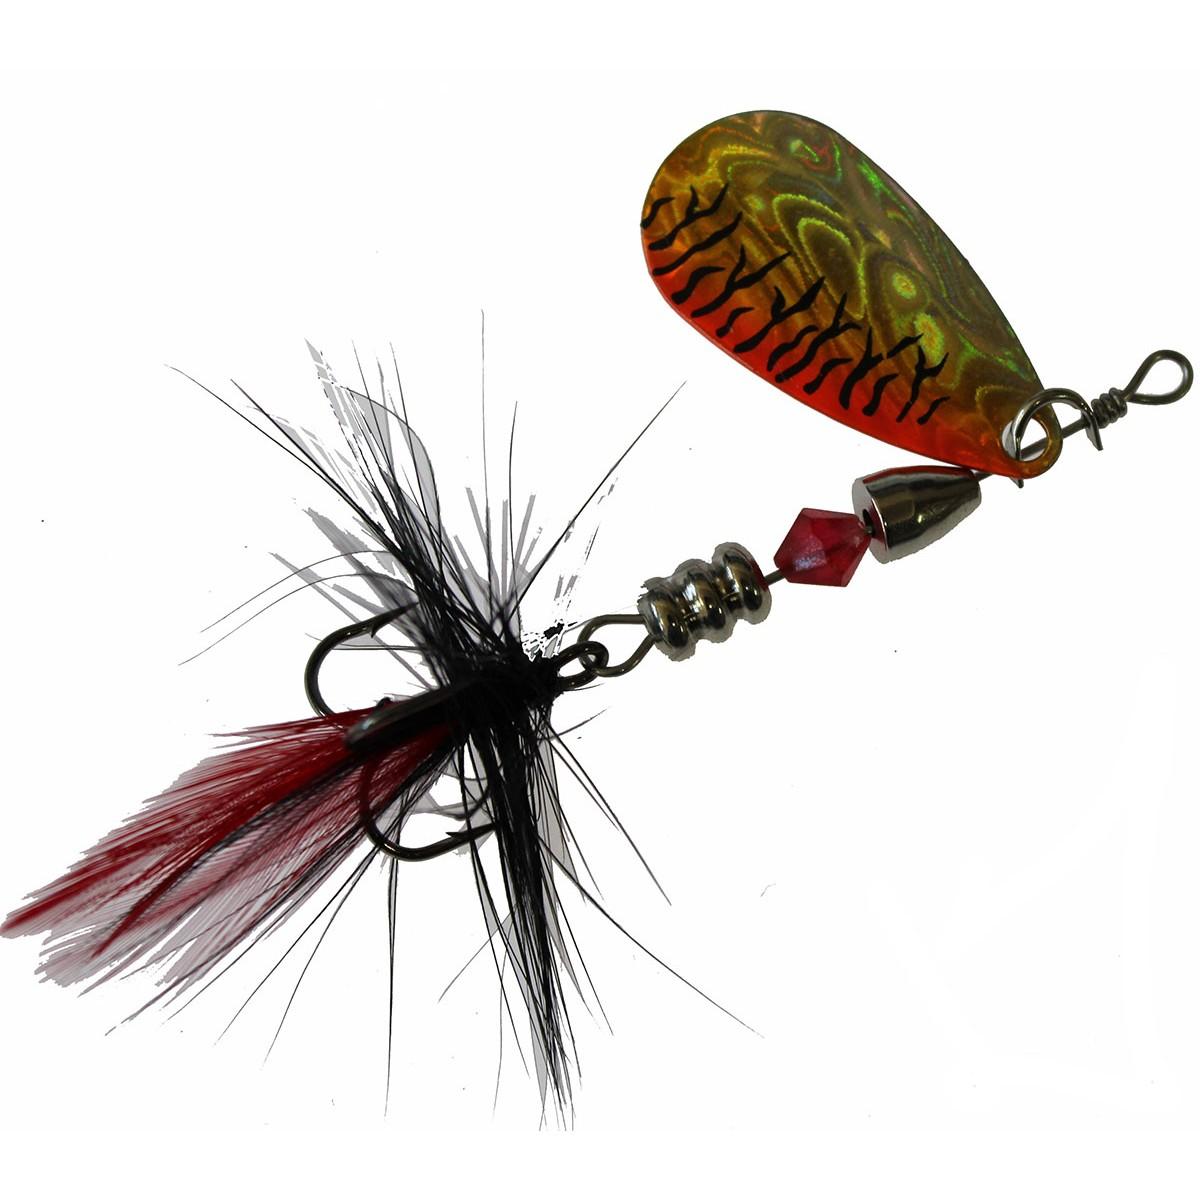 Jaxon Holo Reflex Red Tail HH0H -блесна за пъстърва-блесна за сом